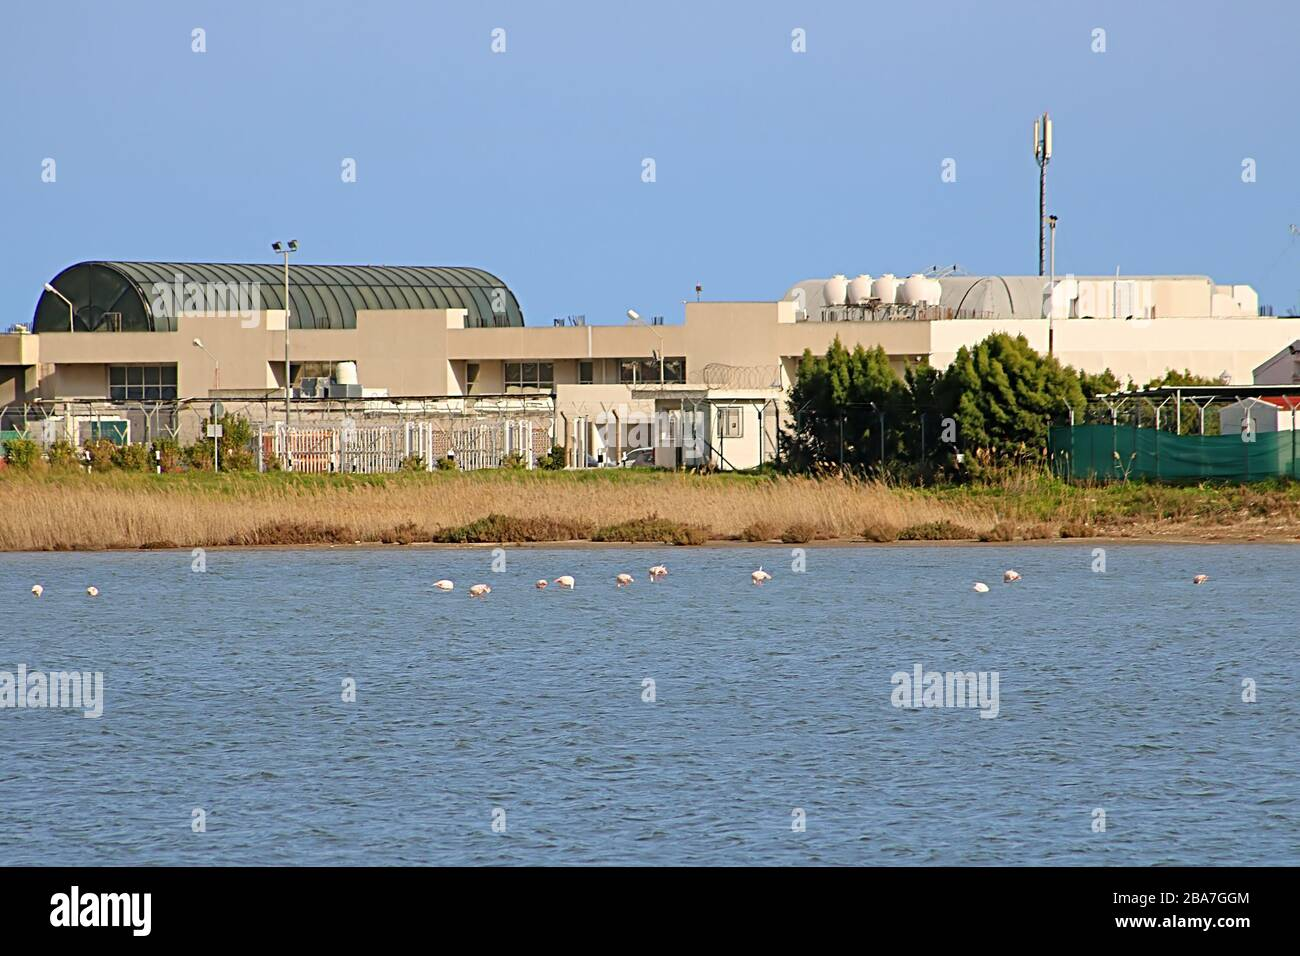 Salt lake and flamingos in Larnaca, Cyprus Stock Photo